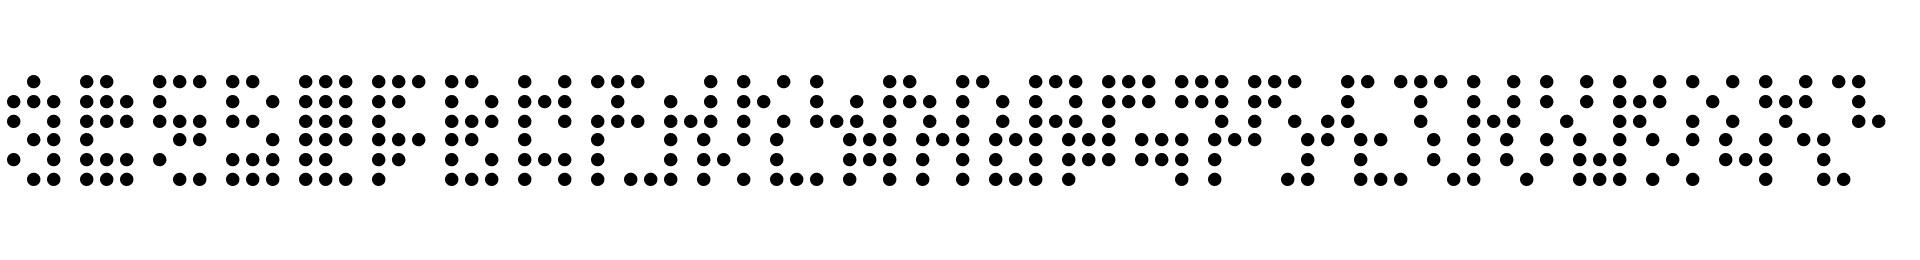 3x3 dots